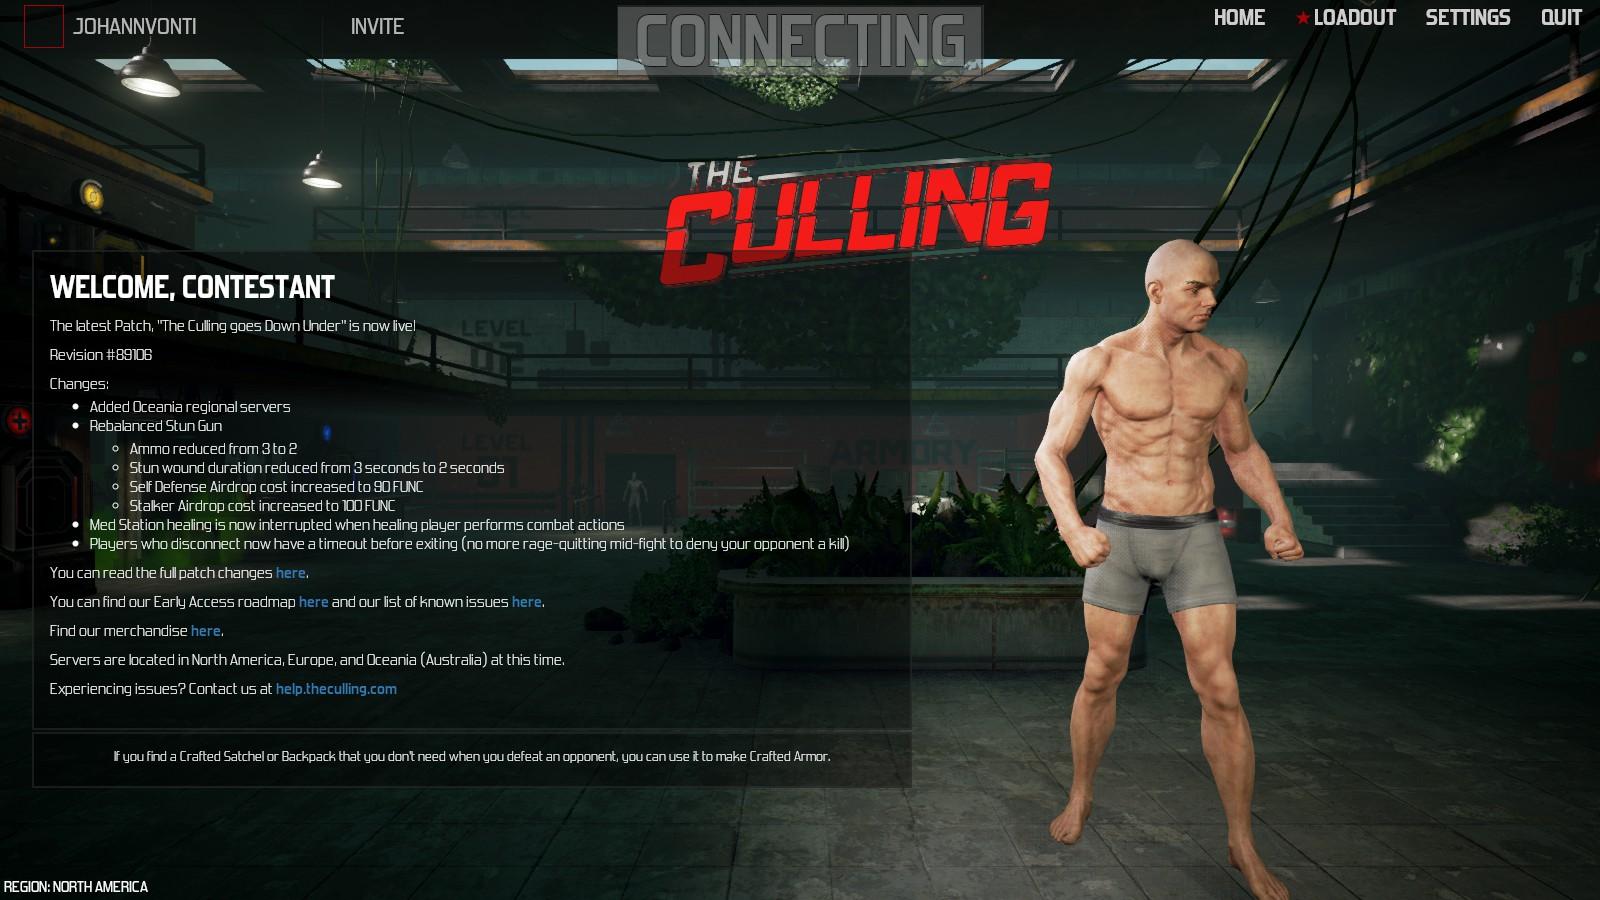 The Culling - Startmenü